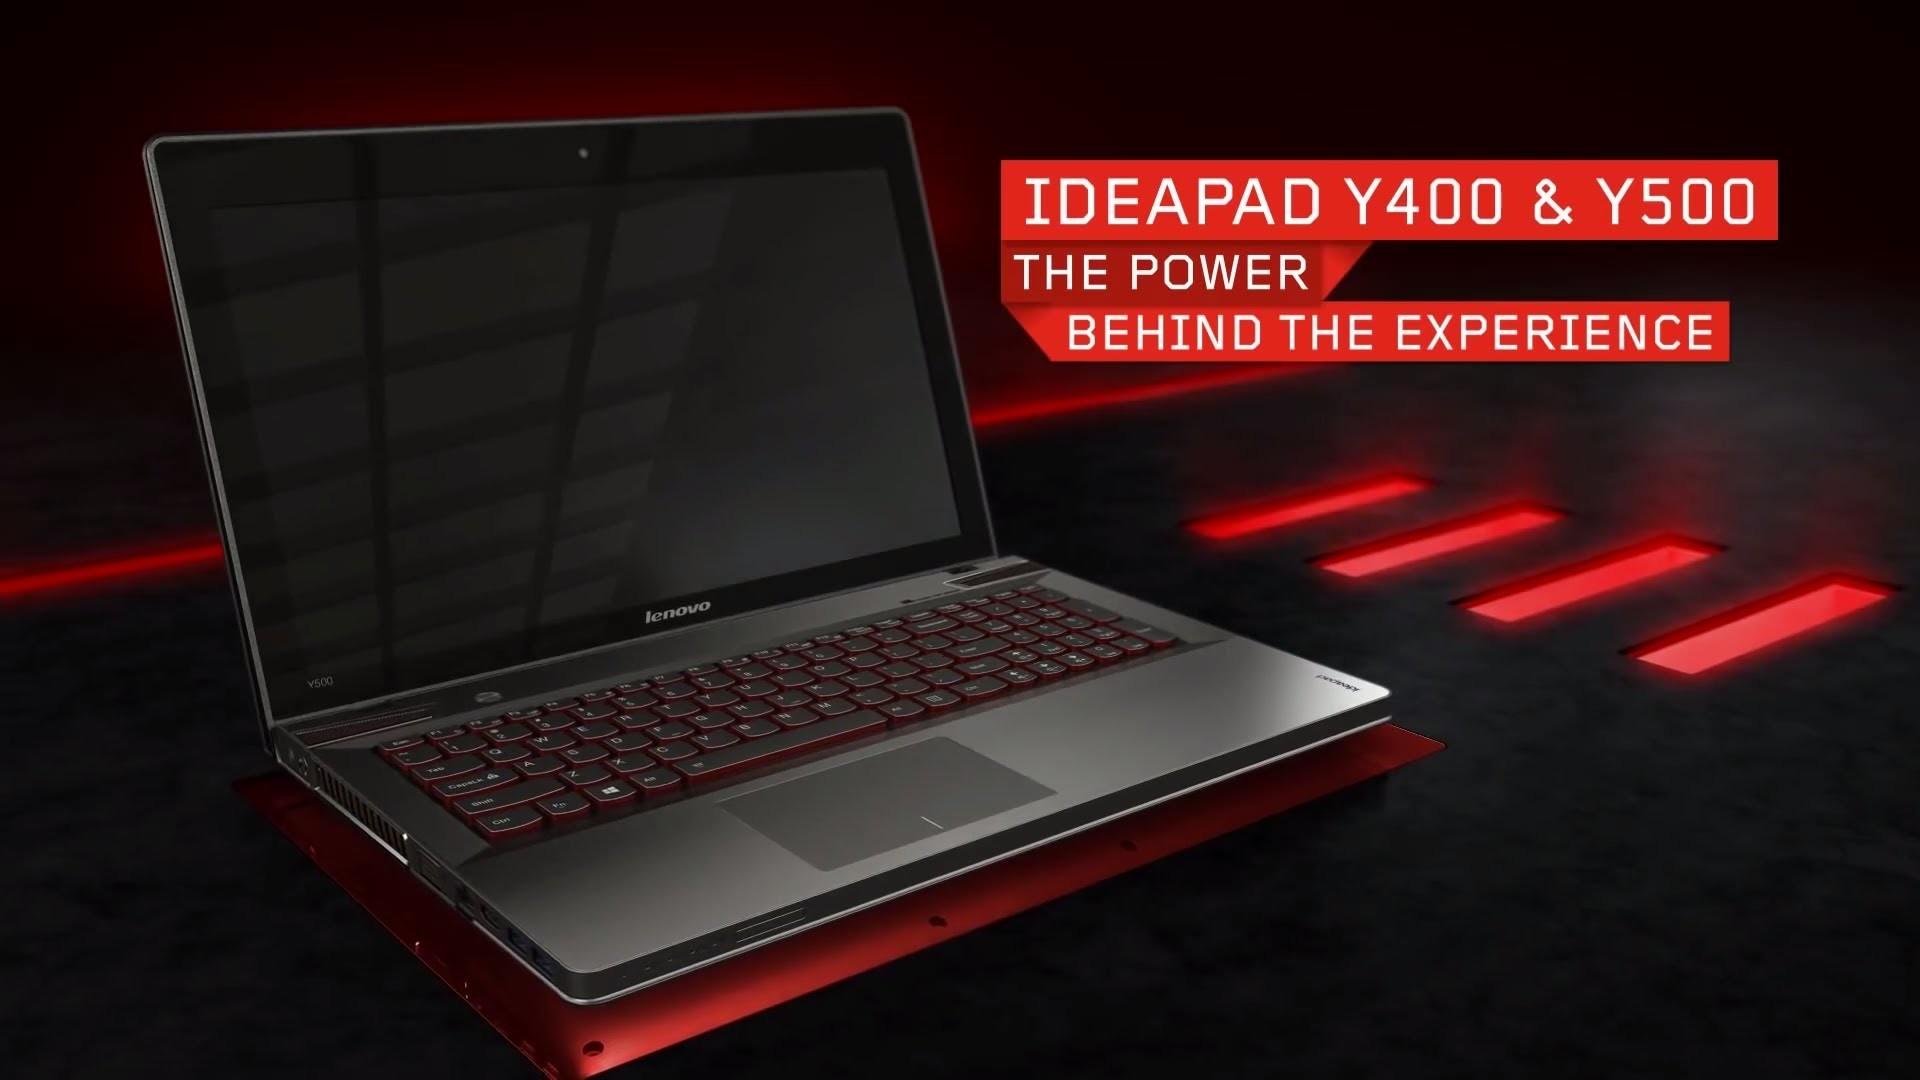 Lenovo Red Wallpaper: Thinkpad Wallpaper HD (75+ Images